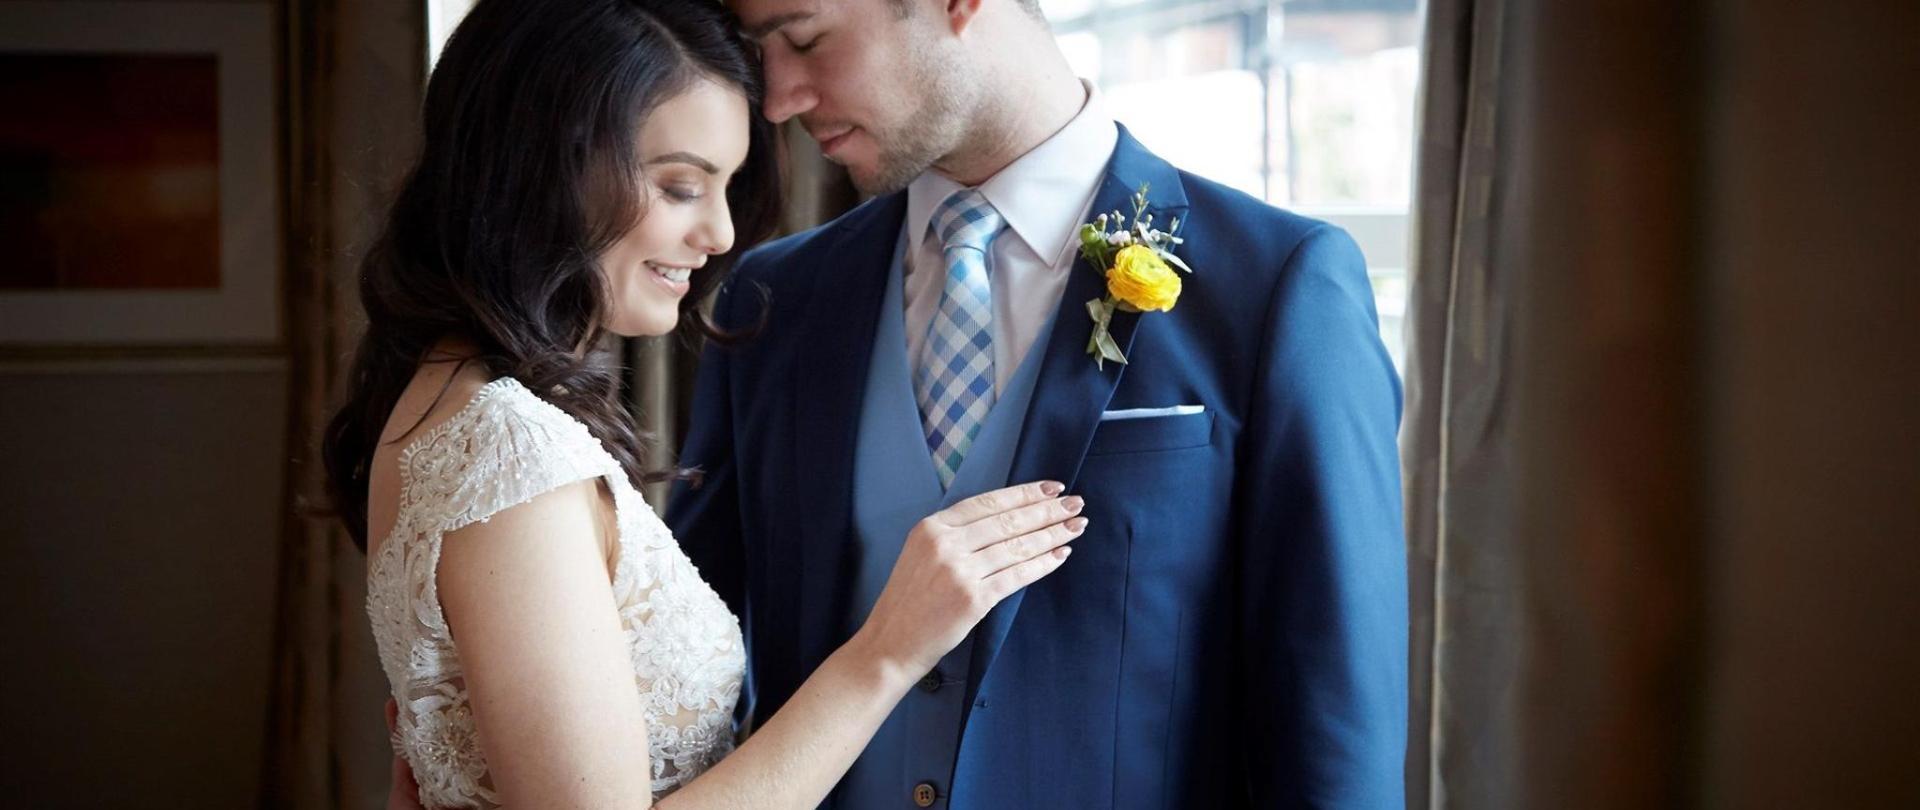 weddings-malone-lodge-hotel-bride-04.jpg